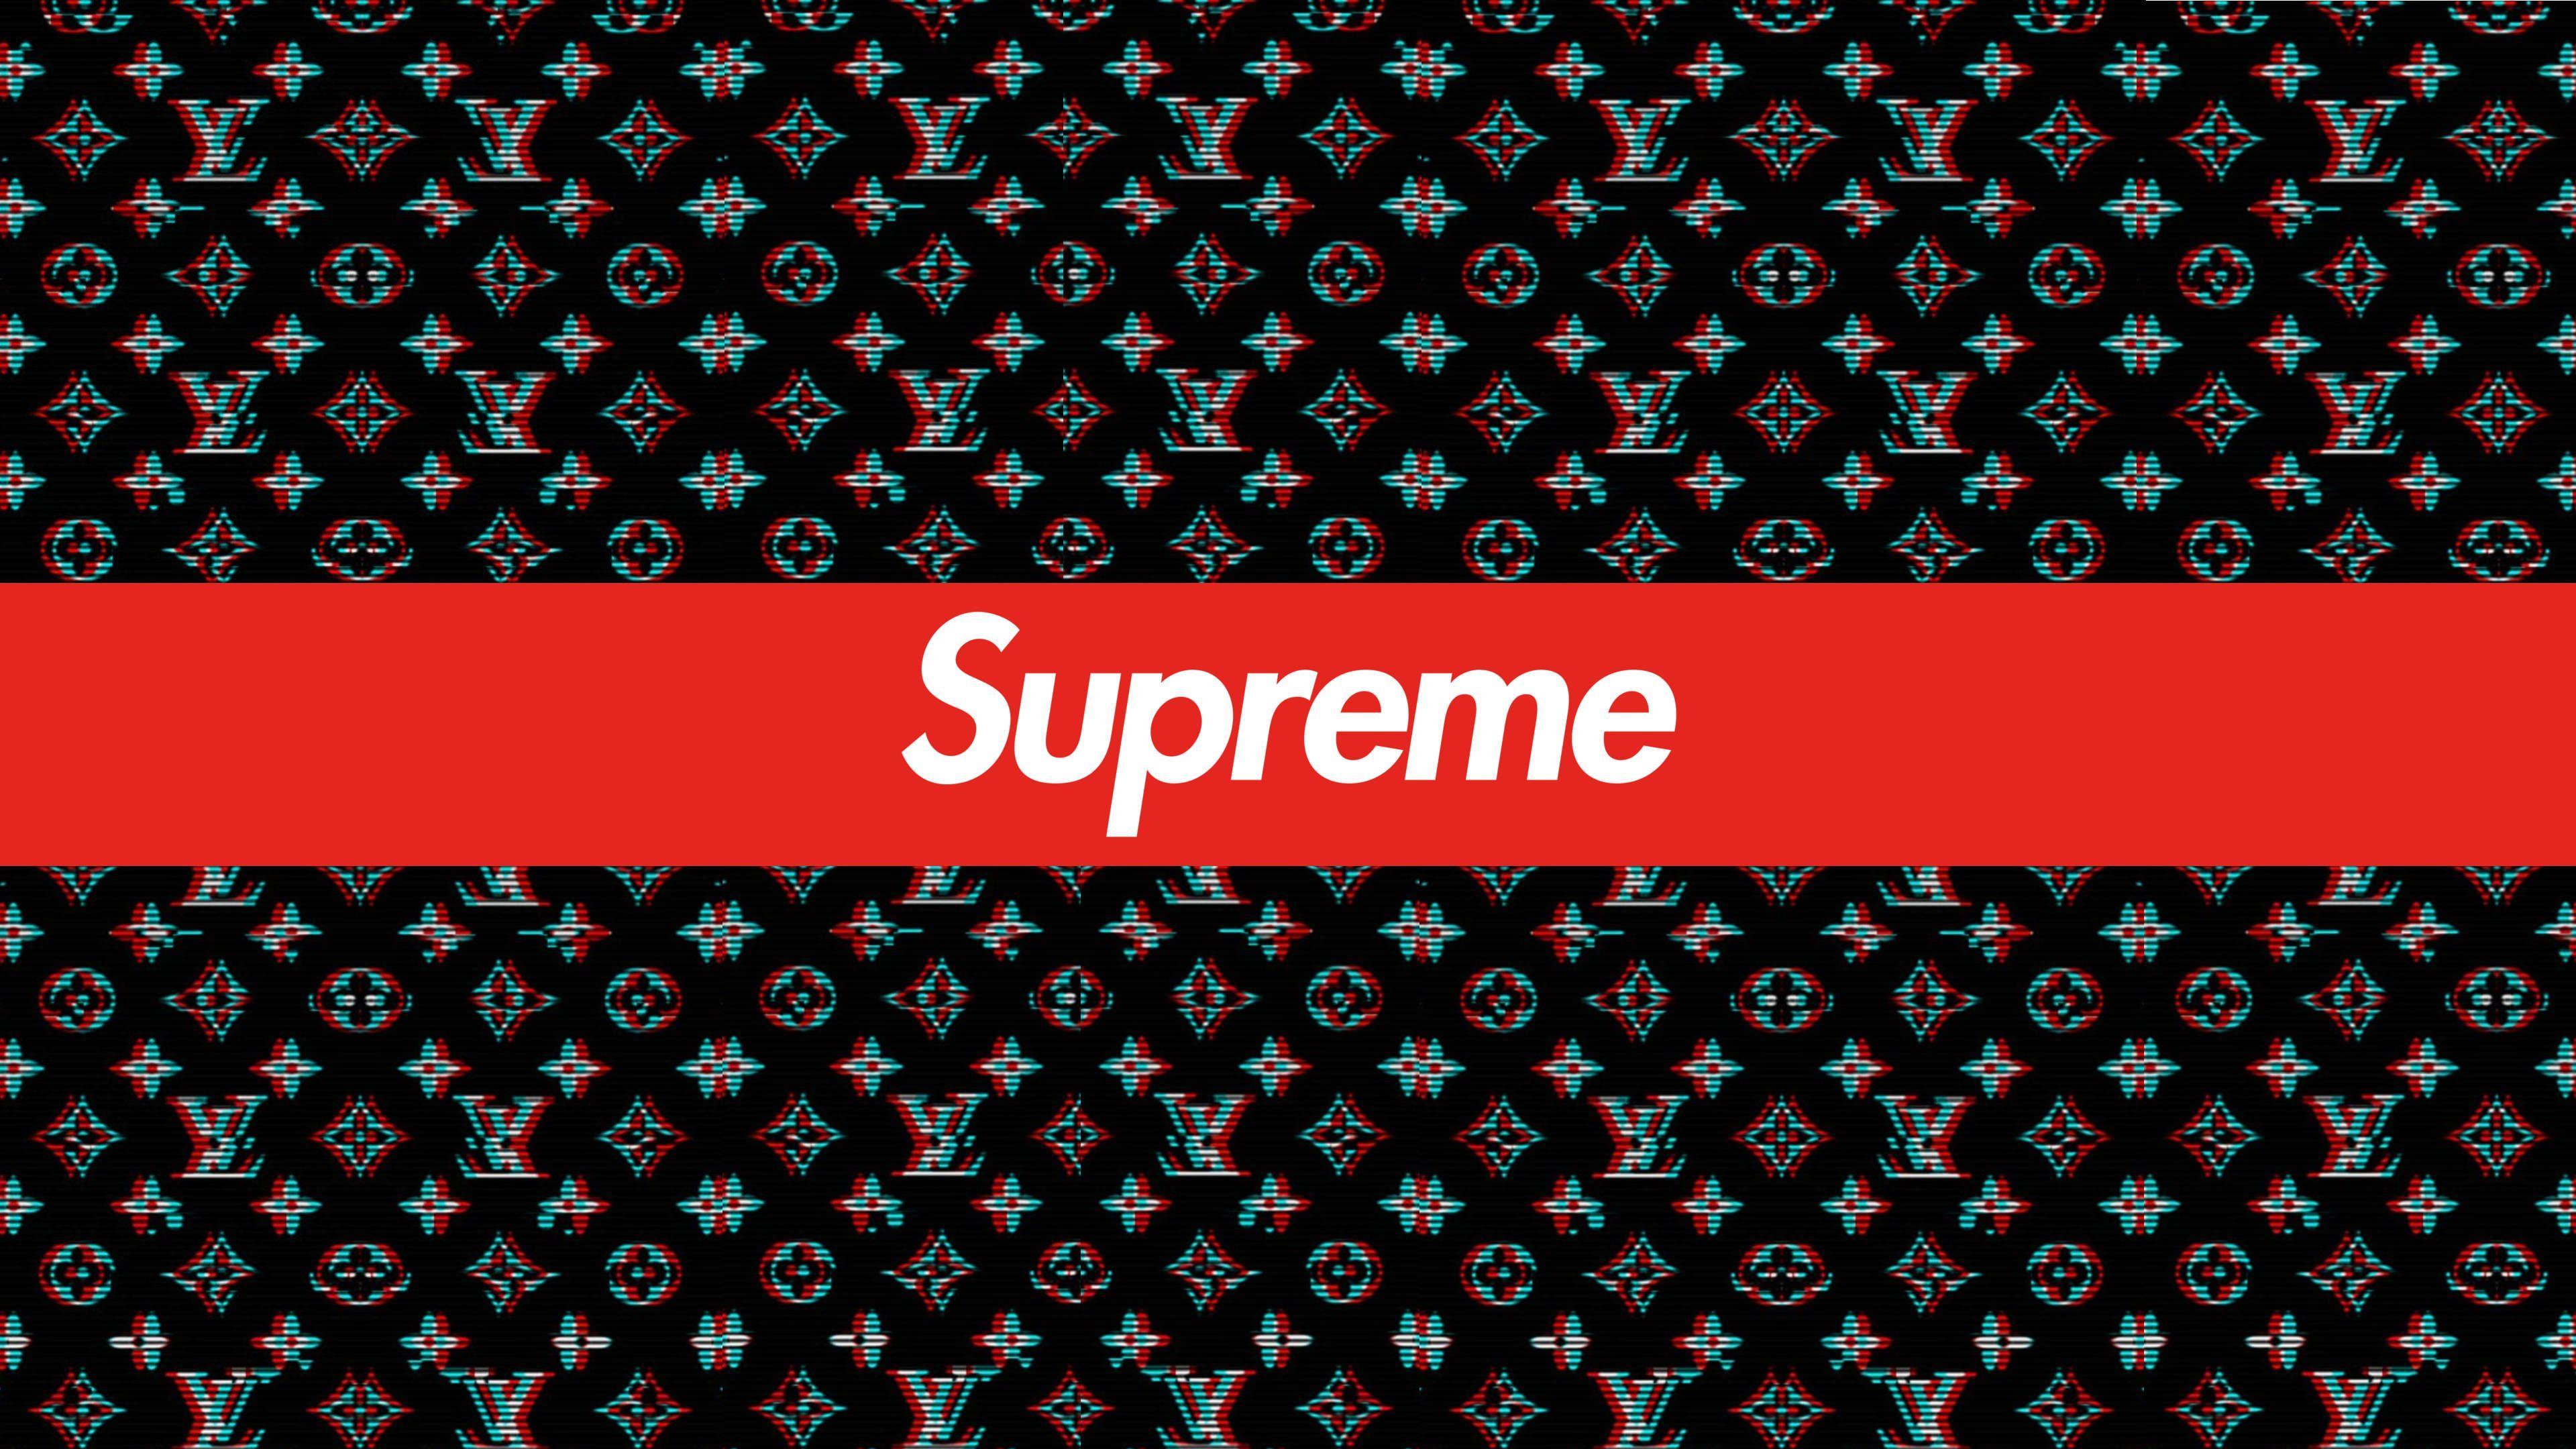 Supreme Wallpaper Hd Iphone 7 Plus Babangrichie Org